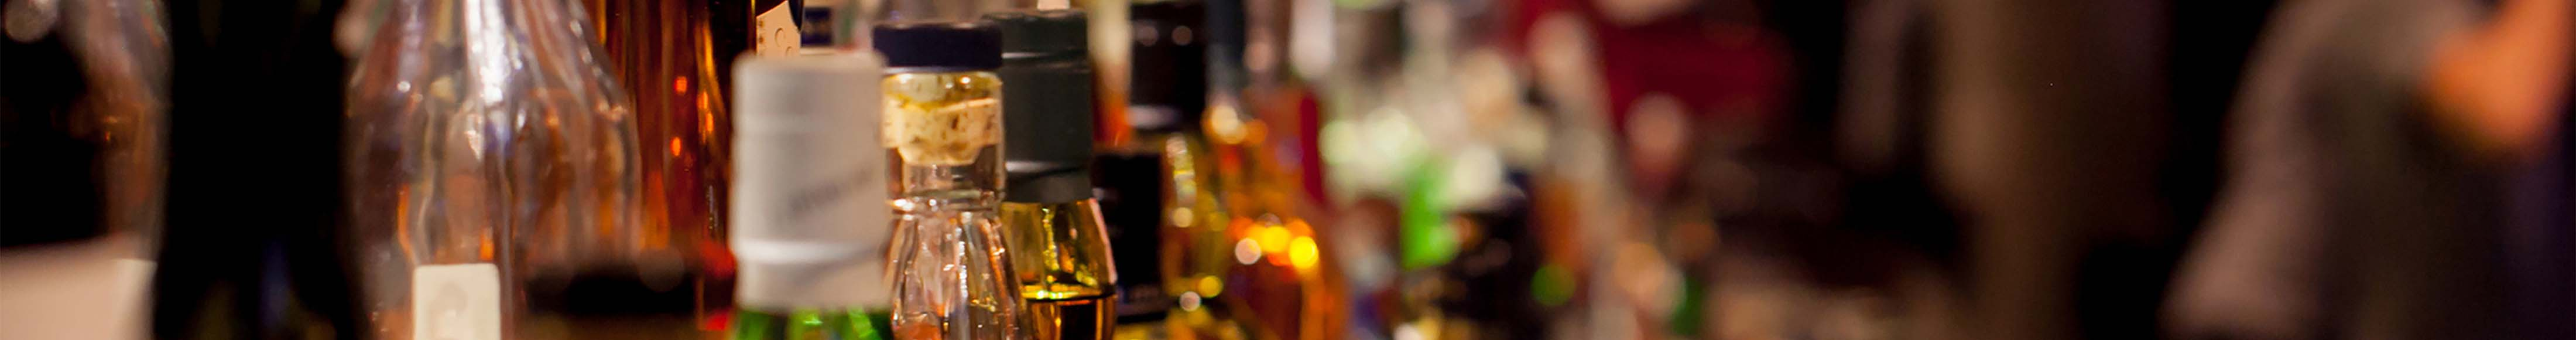 Gedistilleerd & cocktails